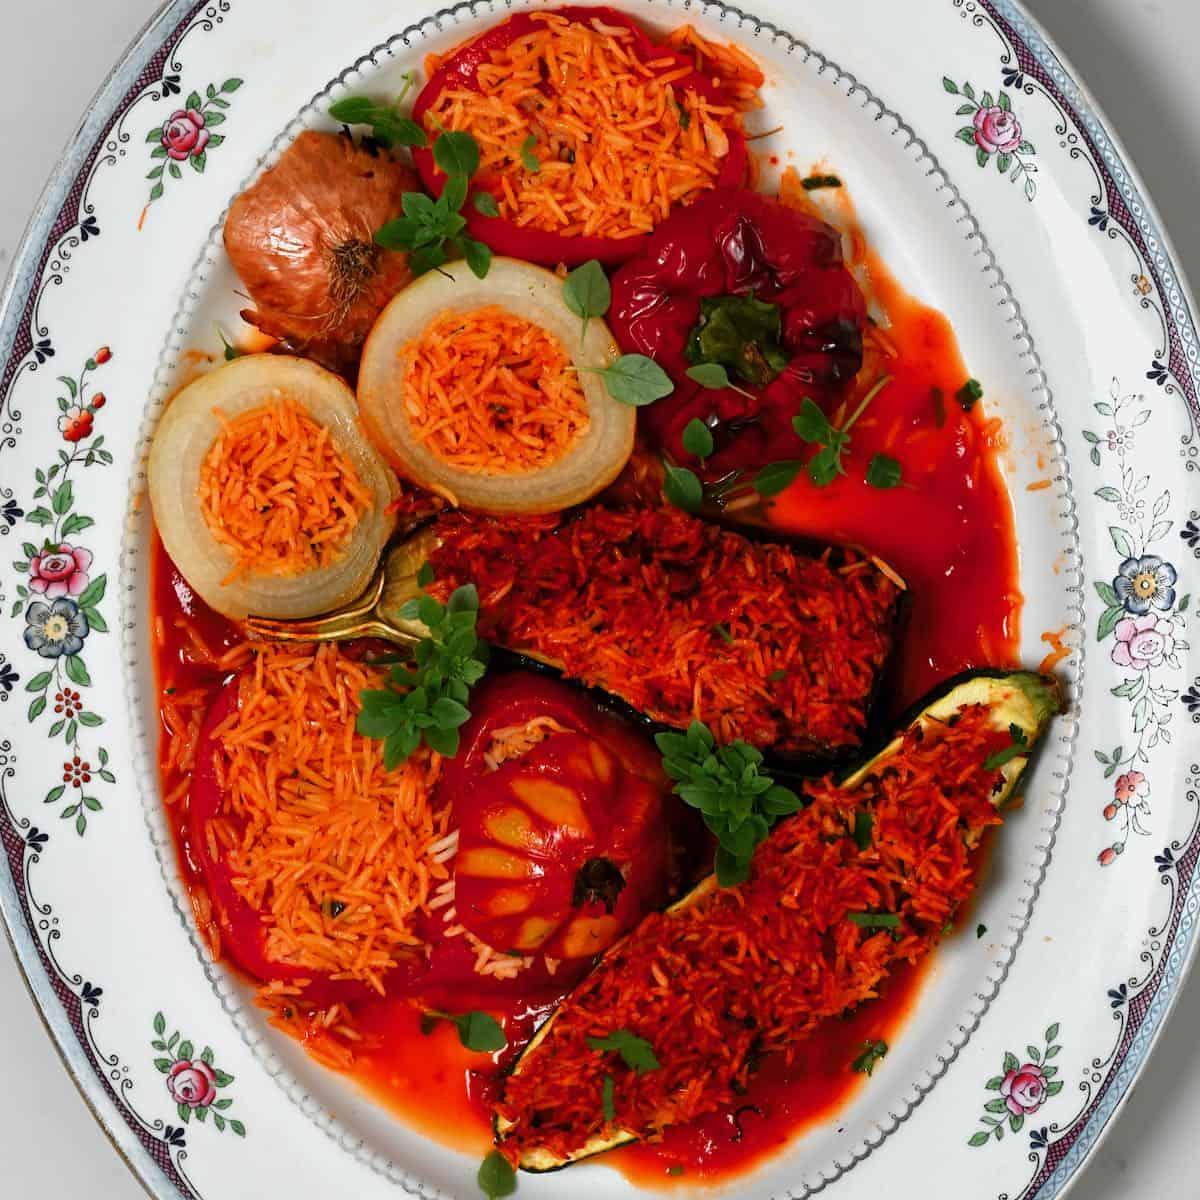 Stuffed mixed veggies served on a plate